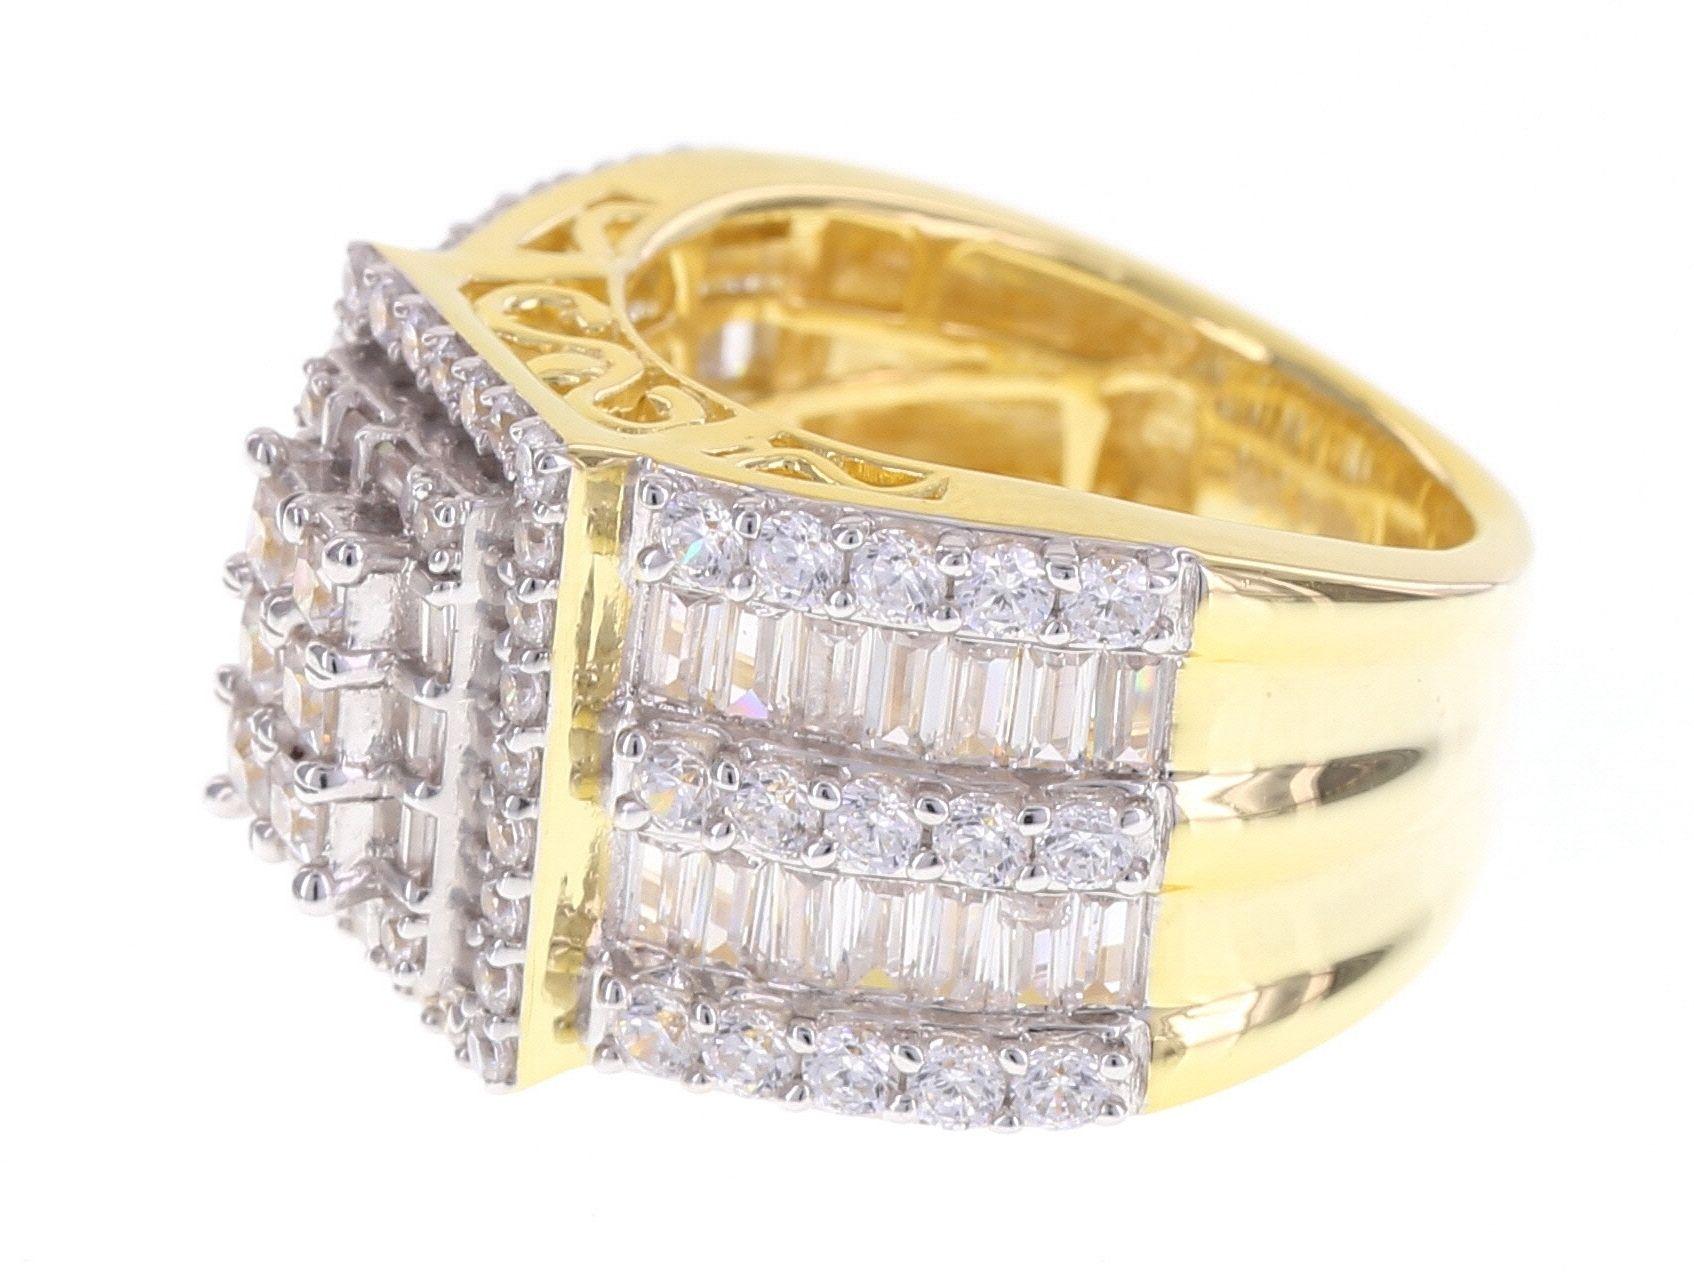 Jtv Diamond Rings >> Jtv Com Champagne Diamond Rings Champagne Diamond Rings